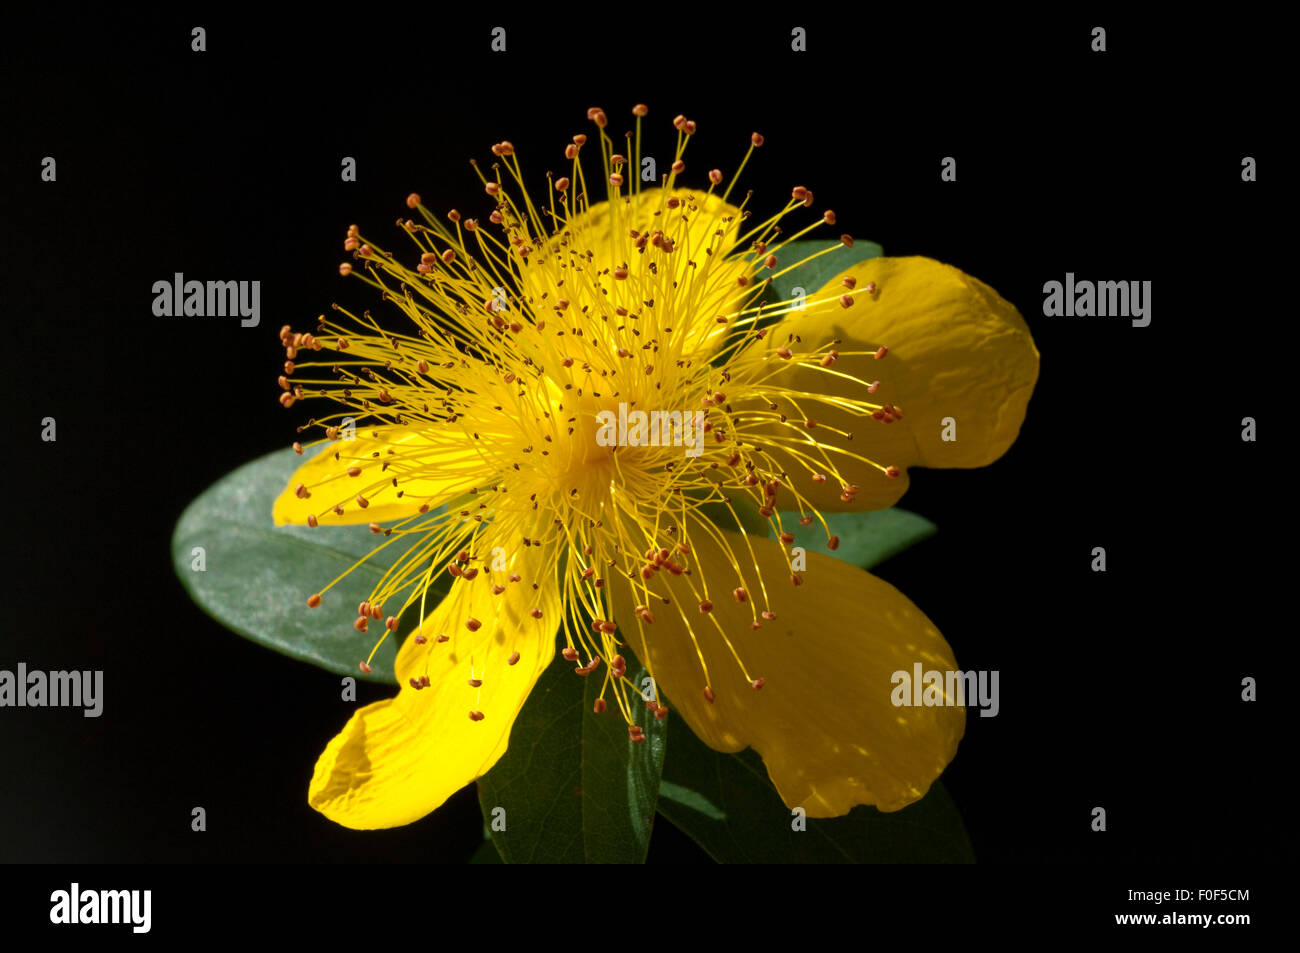 Johanniskraut, Hypericum, calycinum, Kelchartiges, - Stock Image